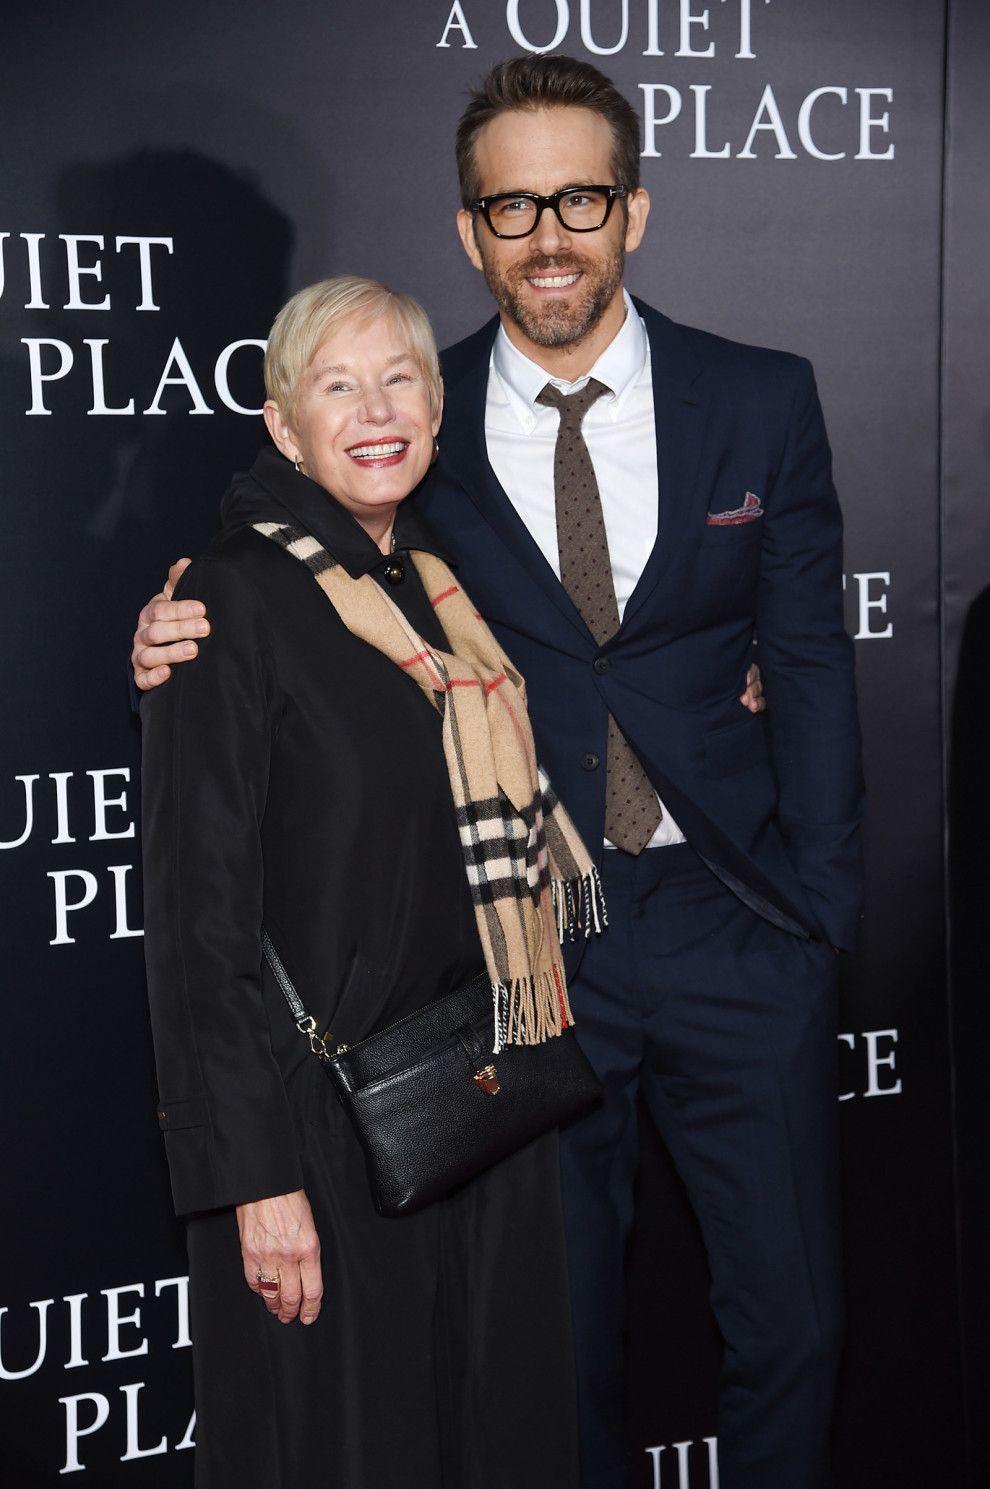 Ryan Reynolds Shut Down Divorce Rumors Yet Again With A